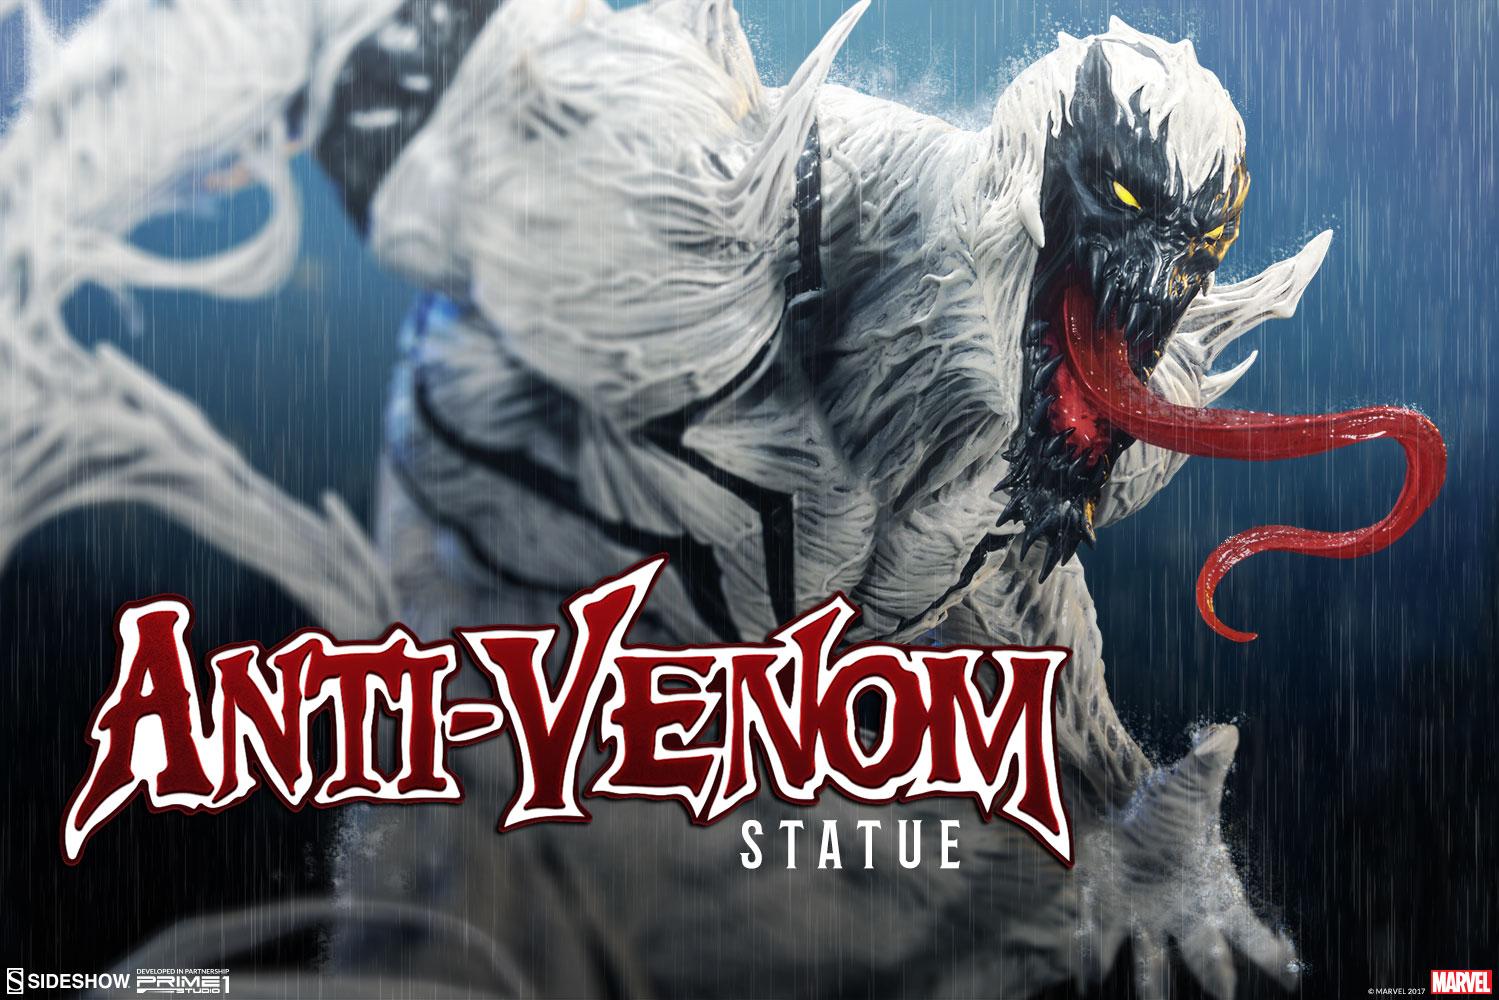 sideshow-prime-1-studio-anti-venom-statue-1